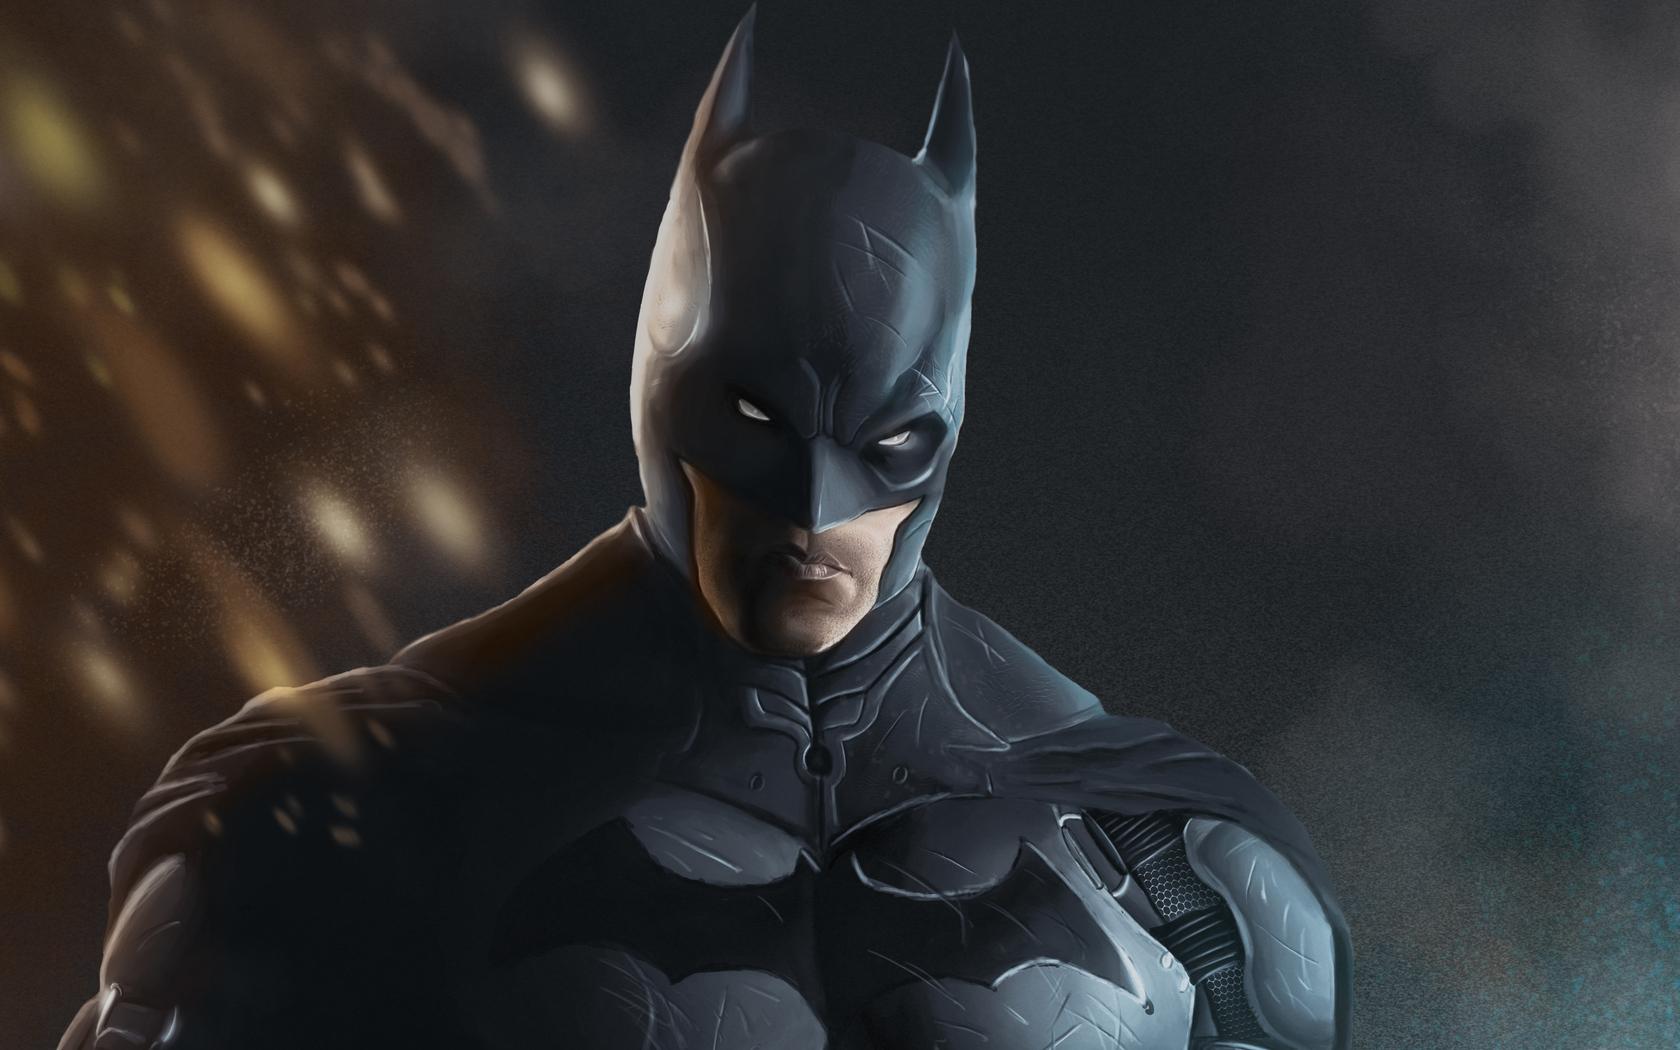 batman-arkham-knight-5k-73.jpg